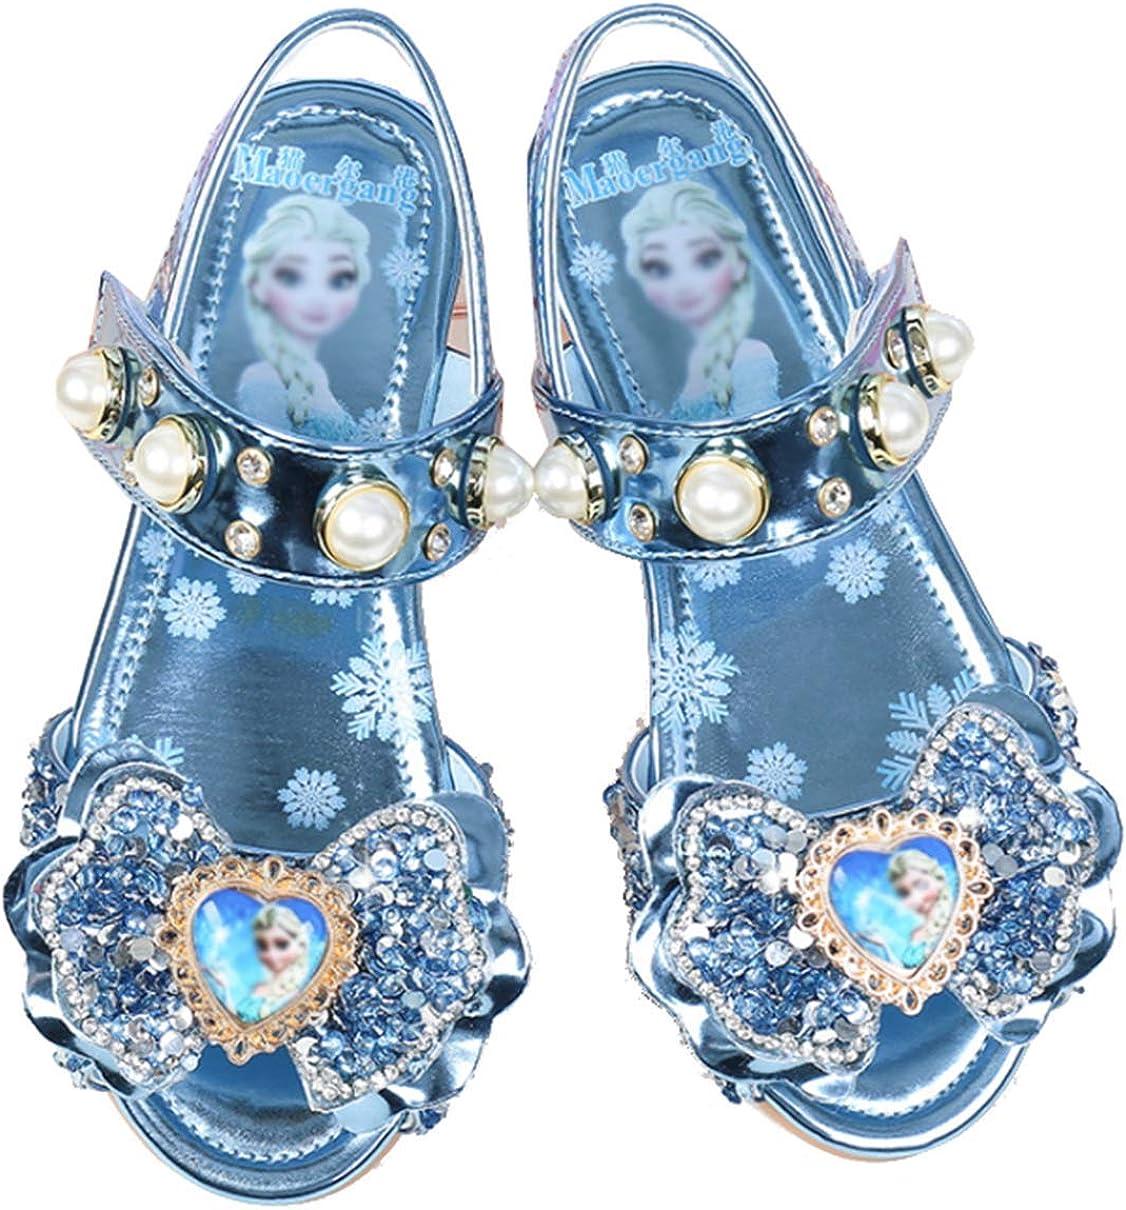 Flamedre Kinder M/ädchen Perle Pailletten Strass Prinzessin Schuhe einzelne Schuhe kleine Schuhe Kristall Schuhe Sandalen Perle Kristall Bling Bowknot Single Princess Schuhe Sandalen